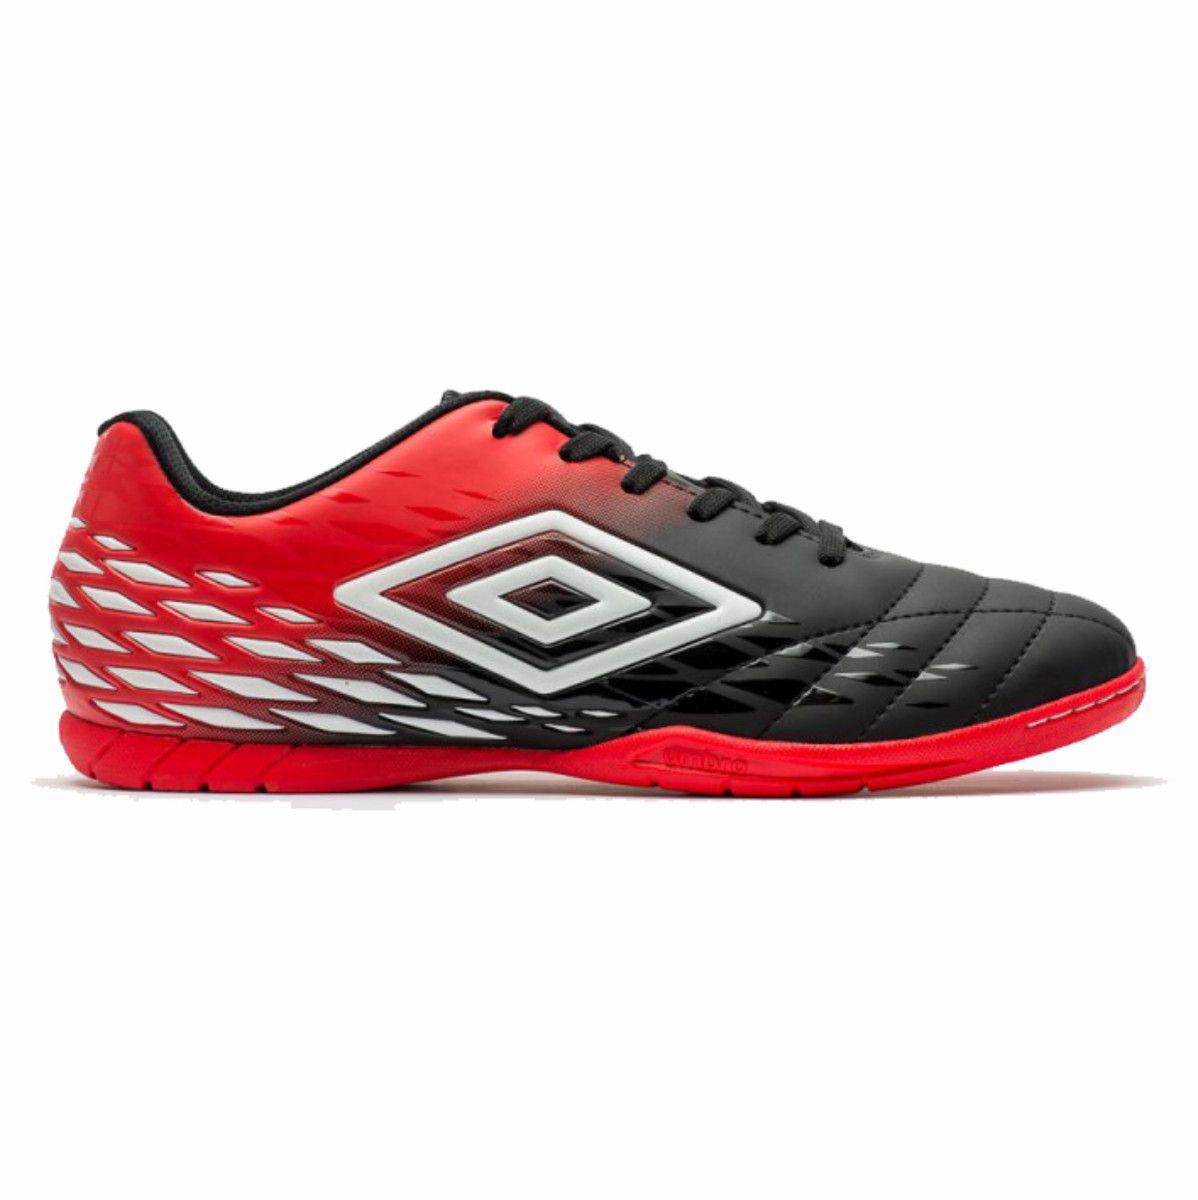 Tenis Umbro Fifty Ii 2 Chuteira Futsal Preto Vermelho